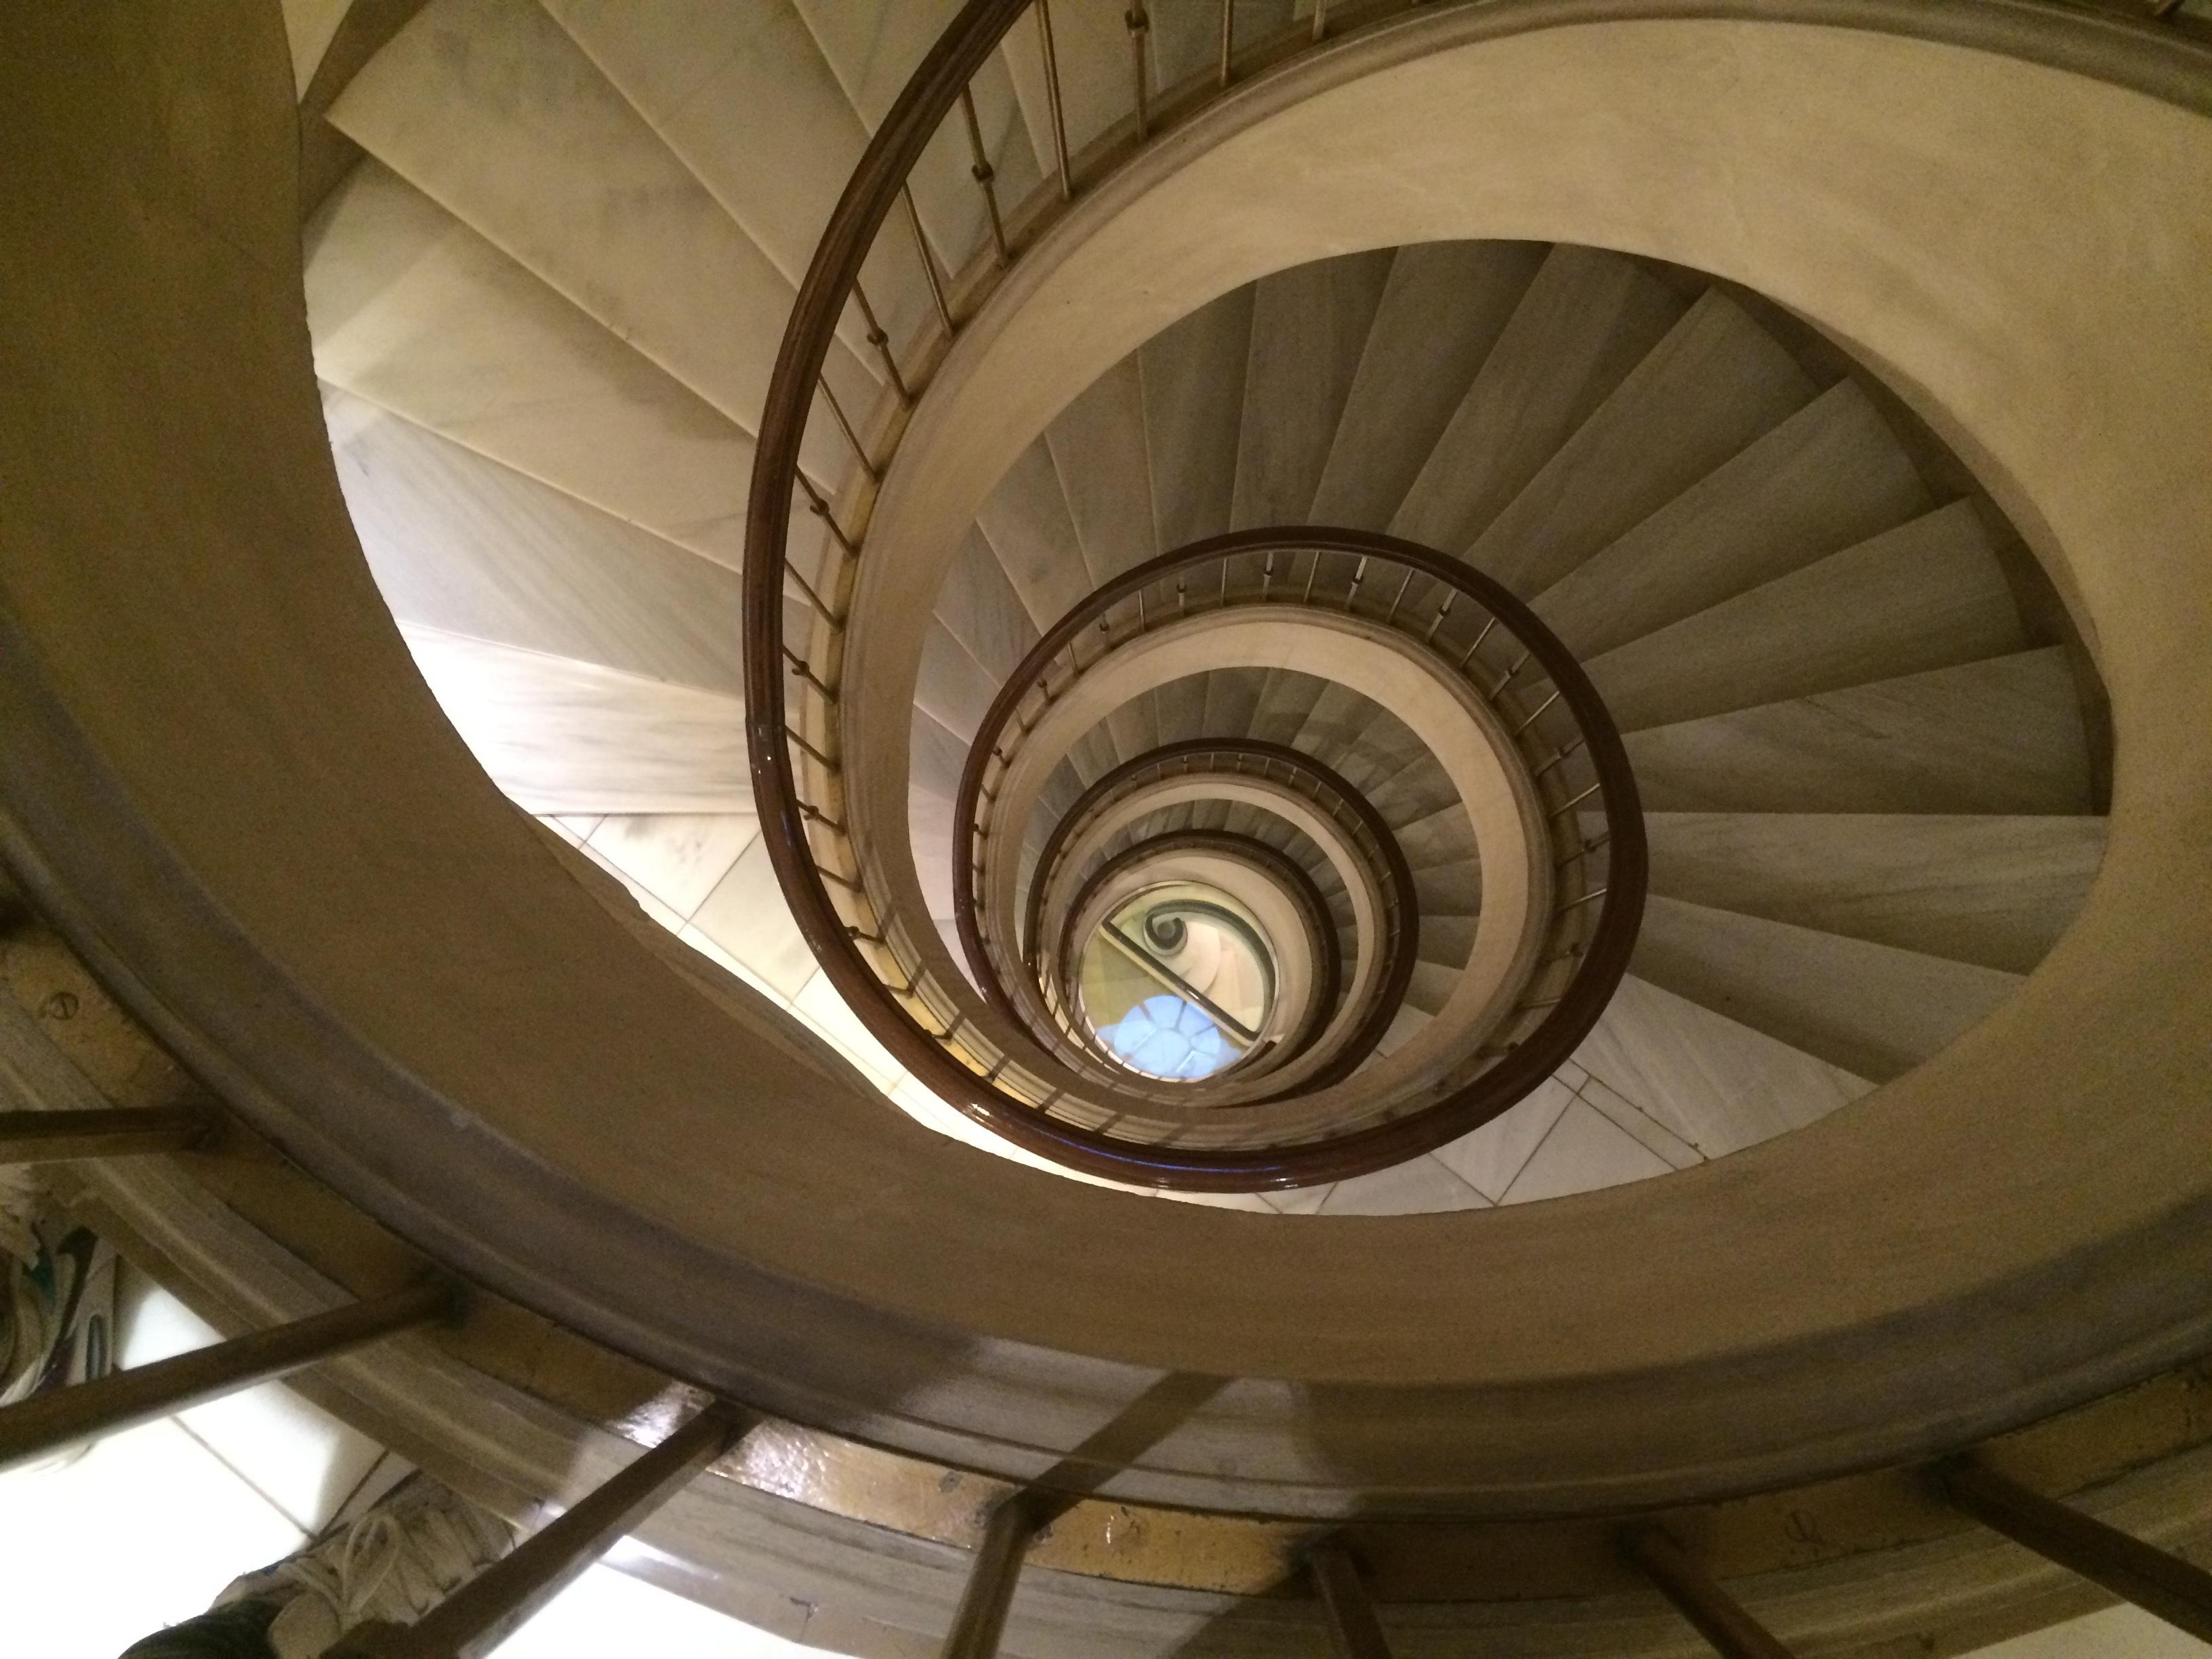 Fotos gratis arquitectura madera rueda espiral - Escalera en espiral ...